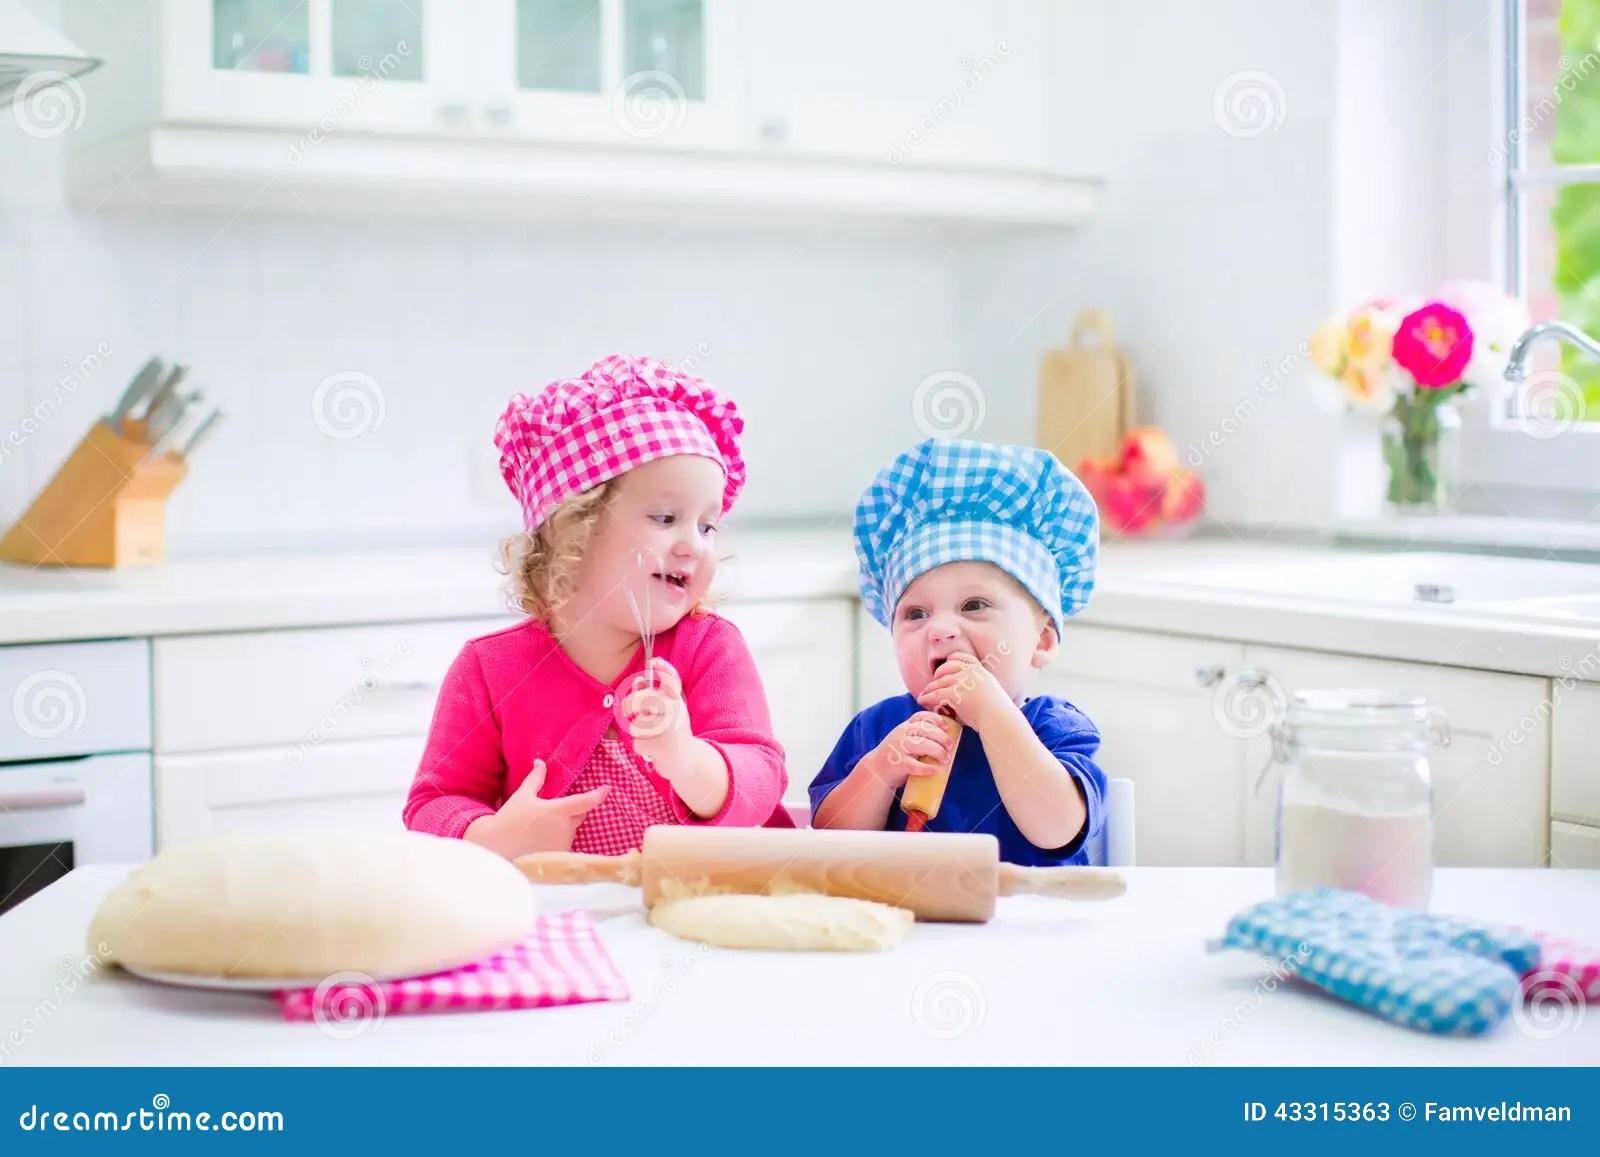 Kids Baking Pie Stock Photo